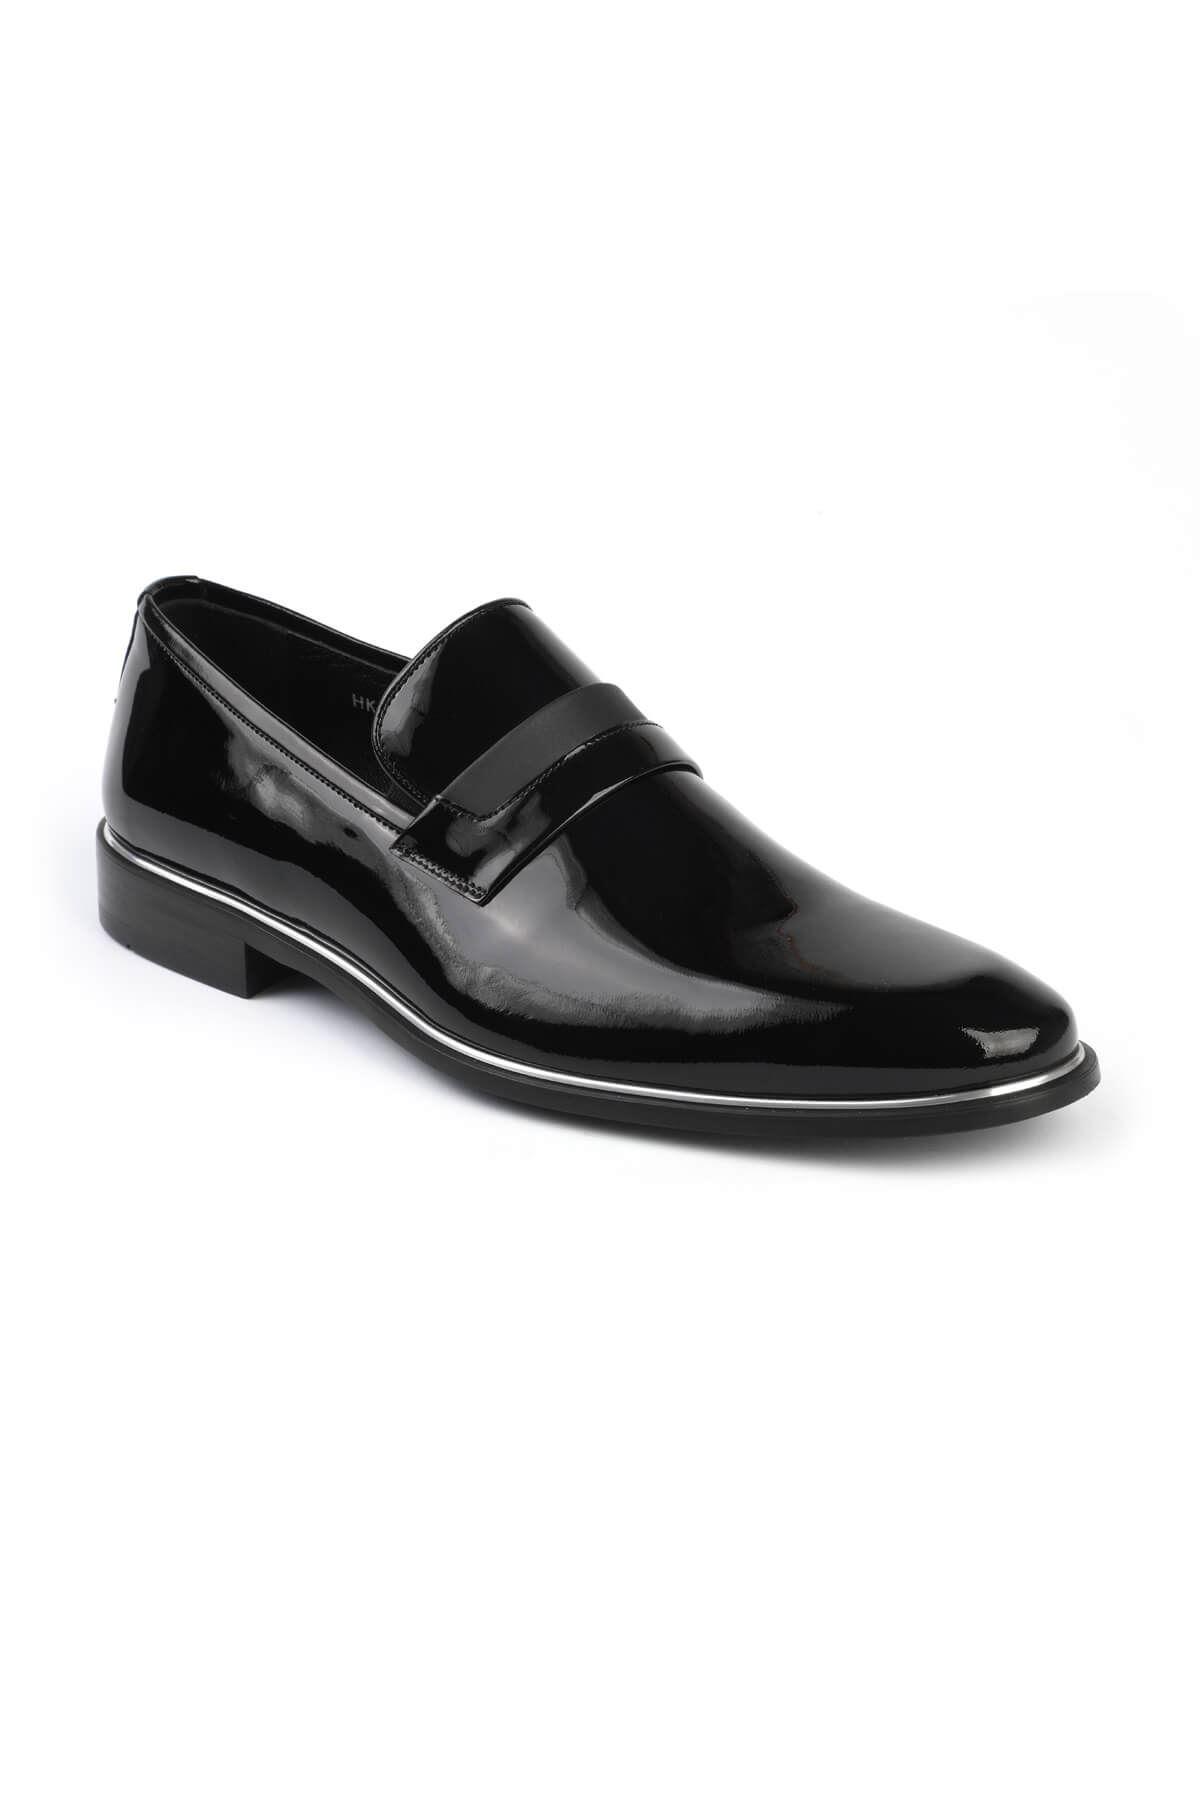 Libero 2602 Black Classic Shoes